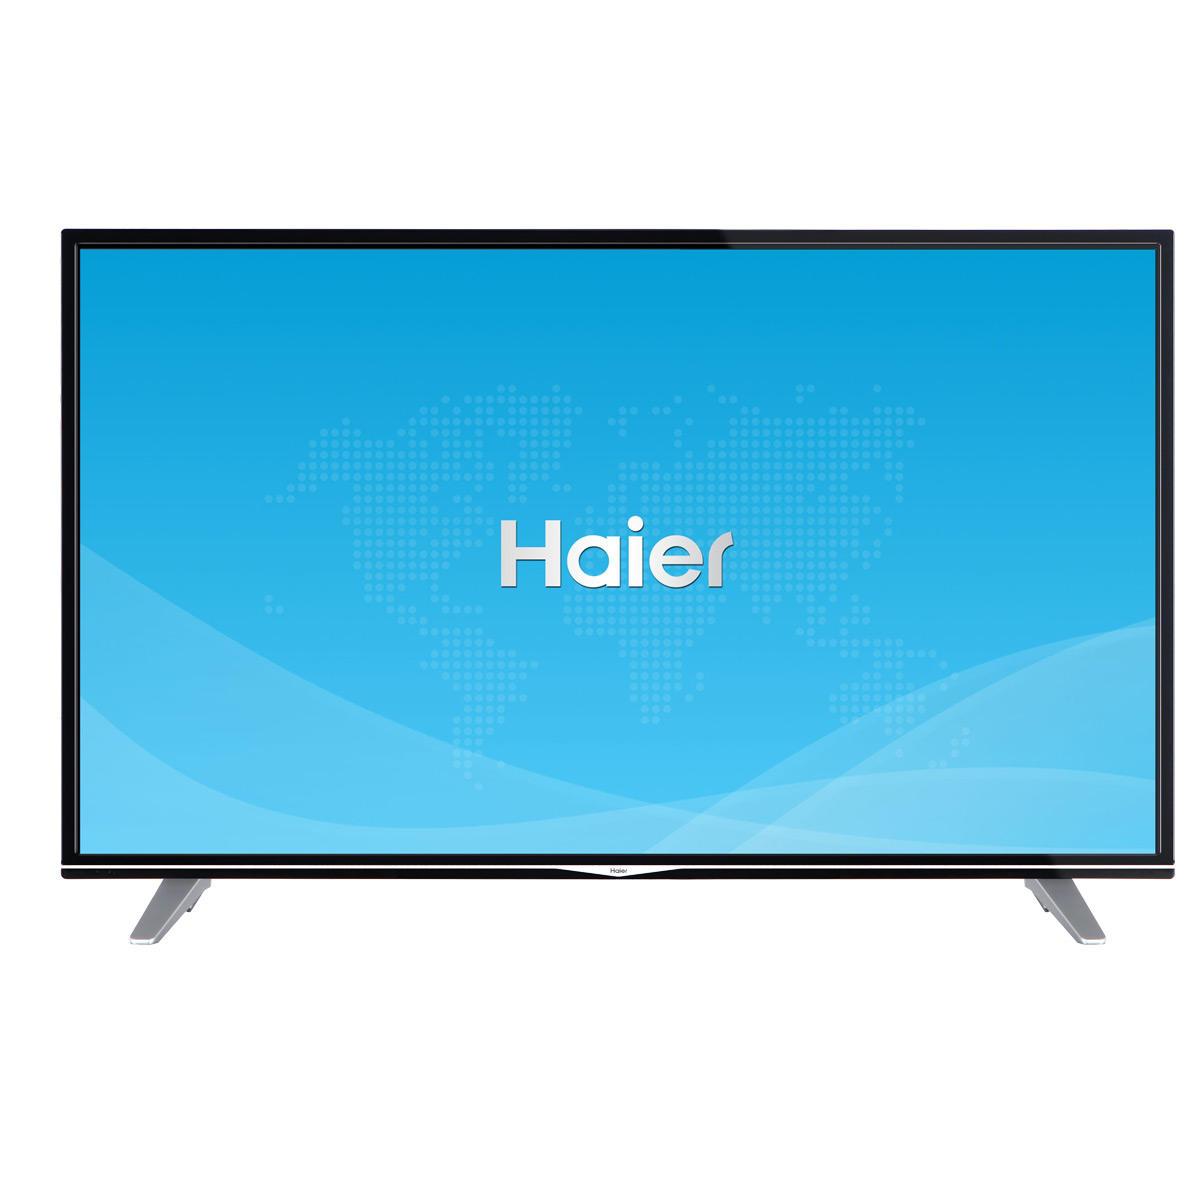 Haier U49H7000 49 calowy smart TV 4k